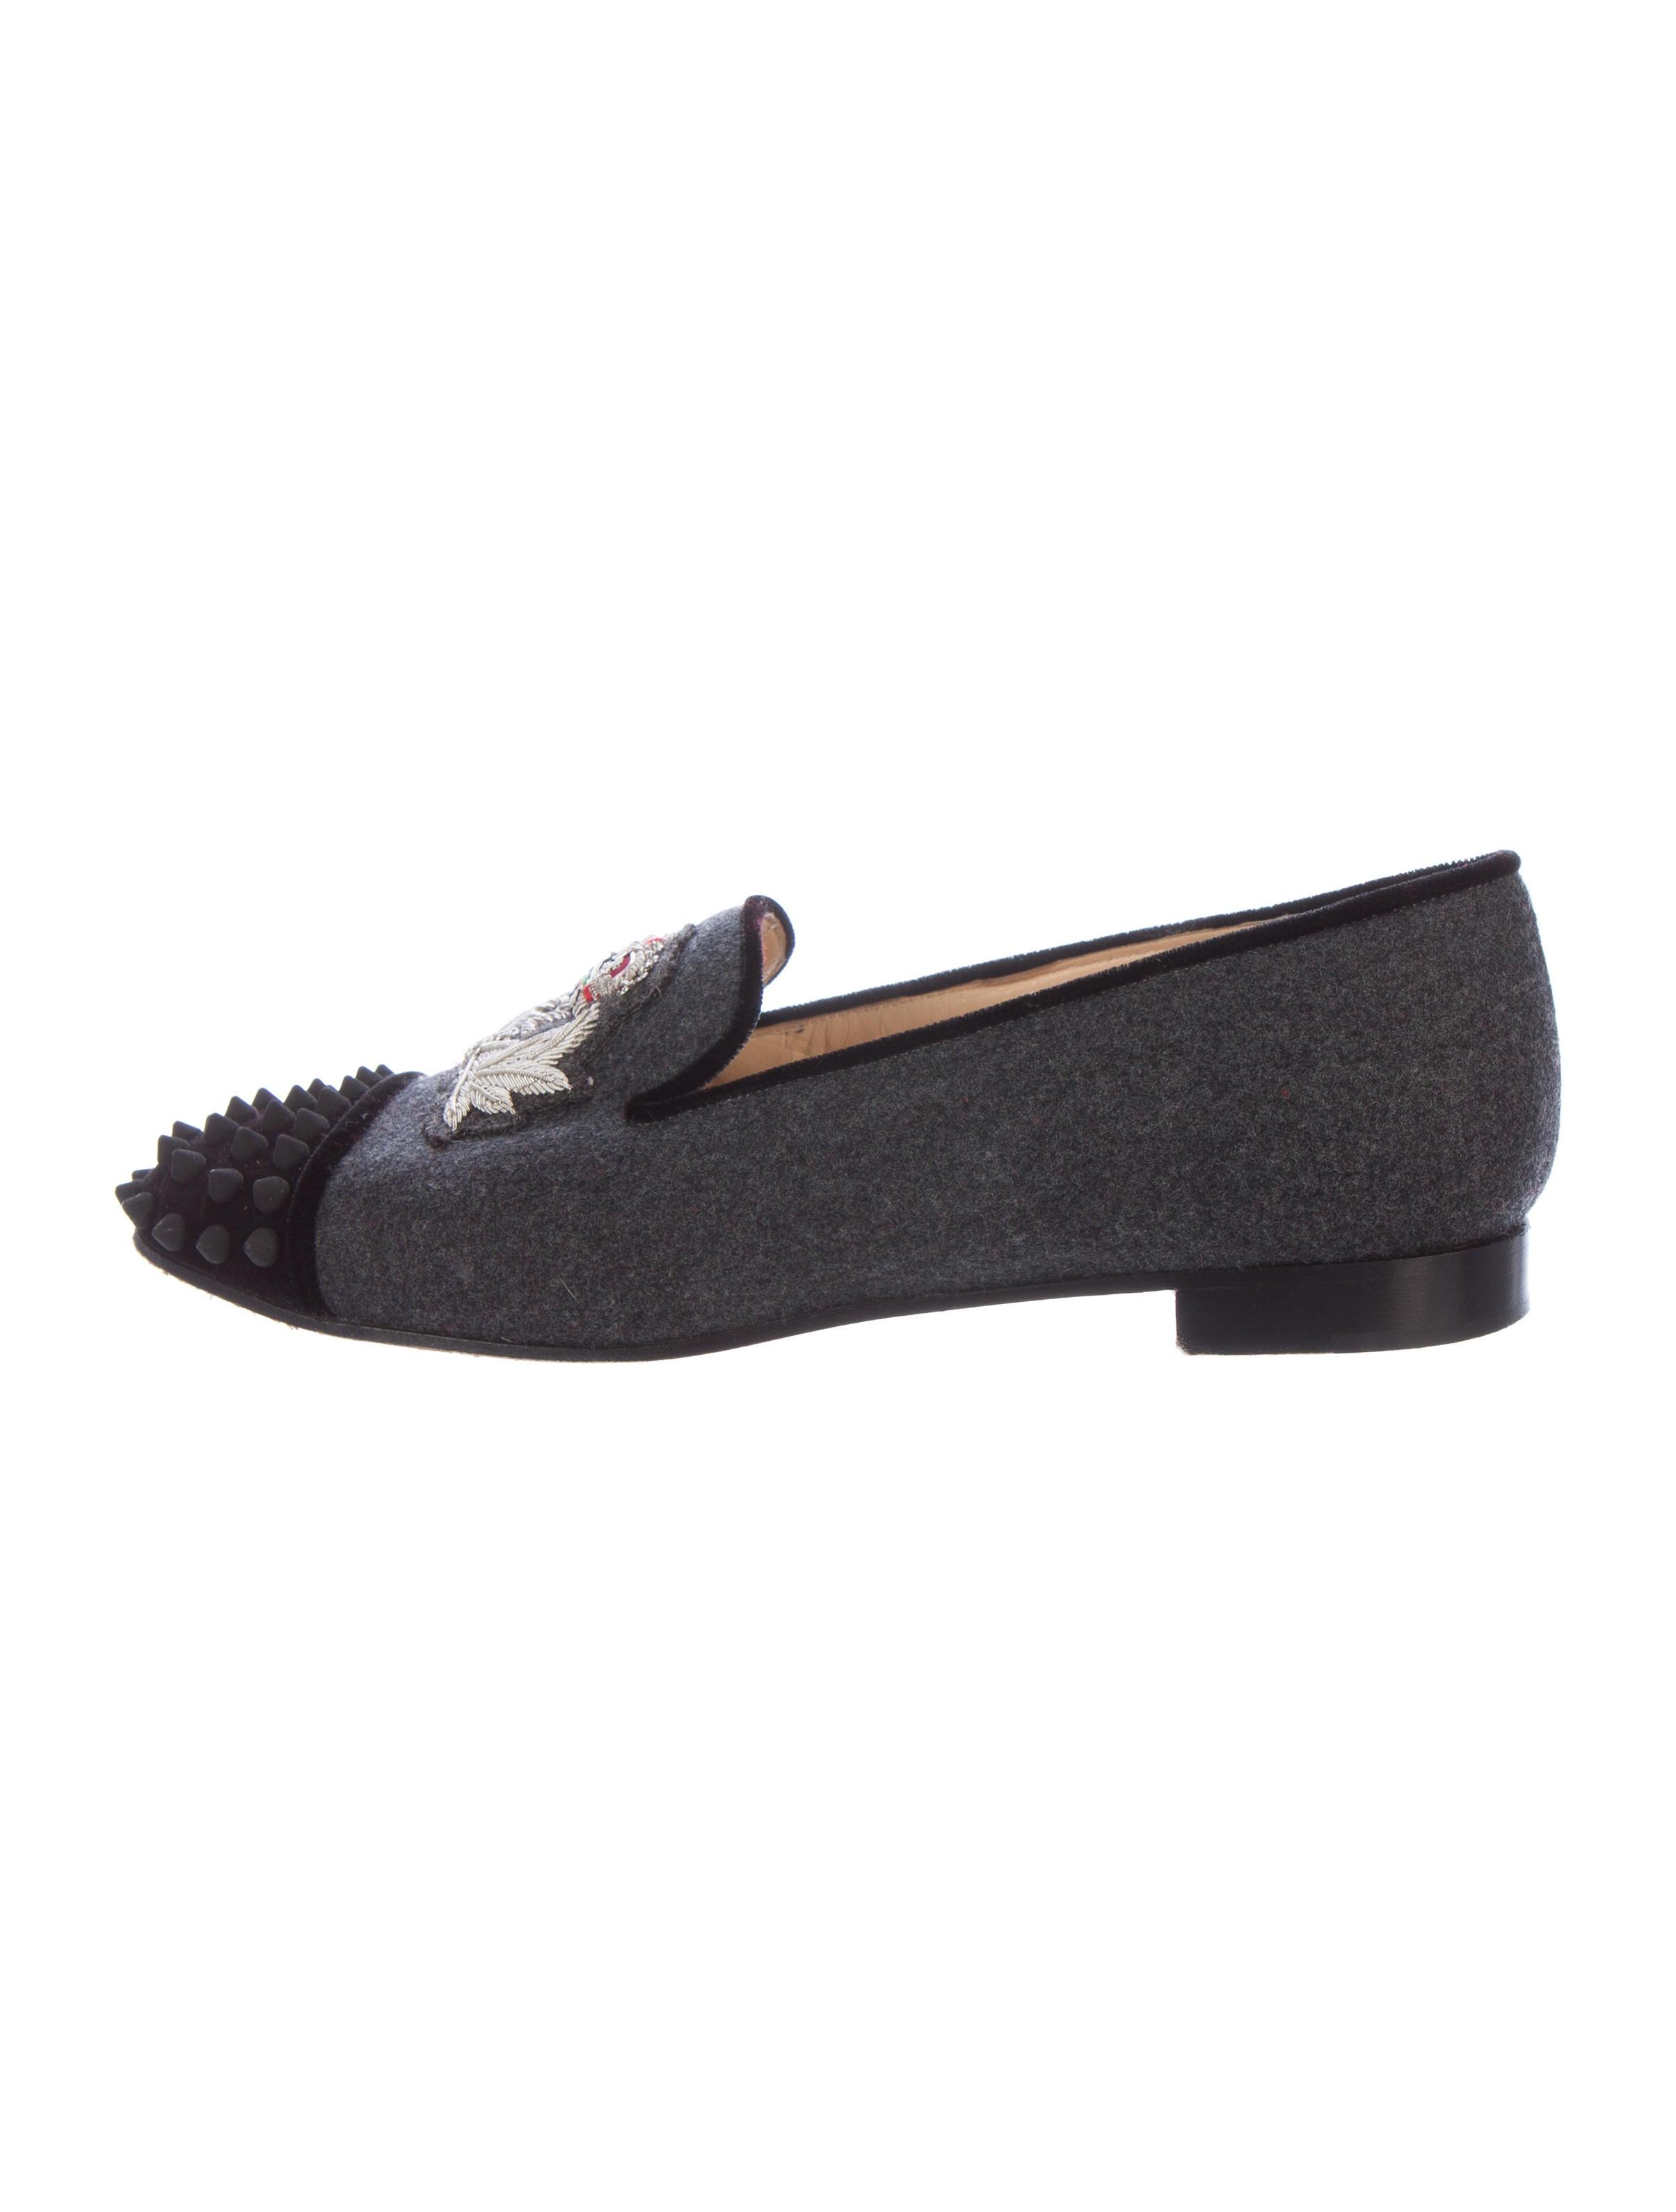 f7056e26cbf Christian Louboutin Intern Spiked Loafers - Shoes - CHT63517